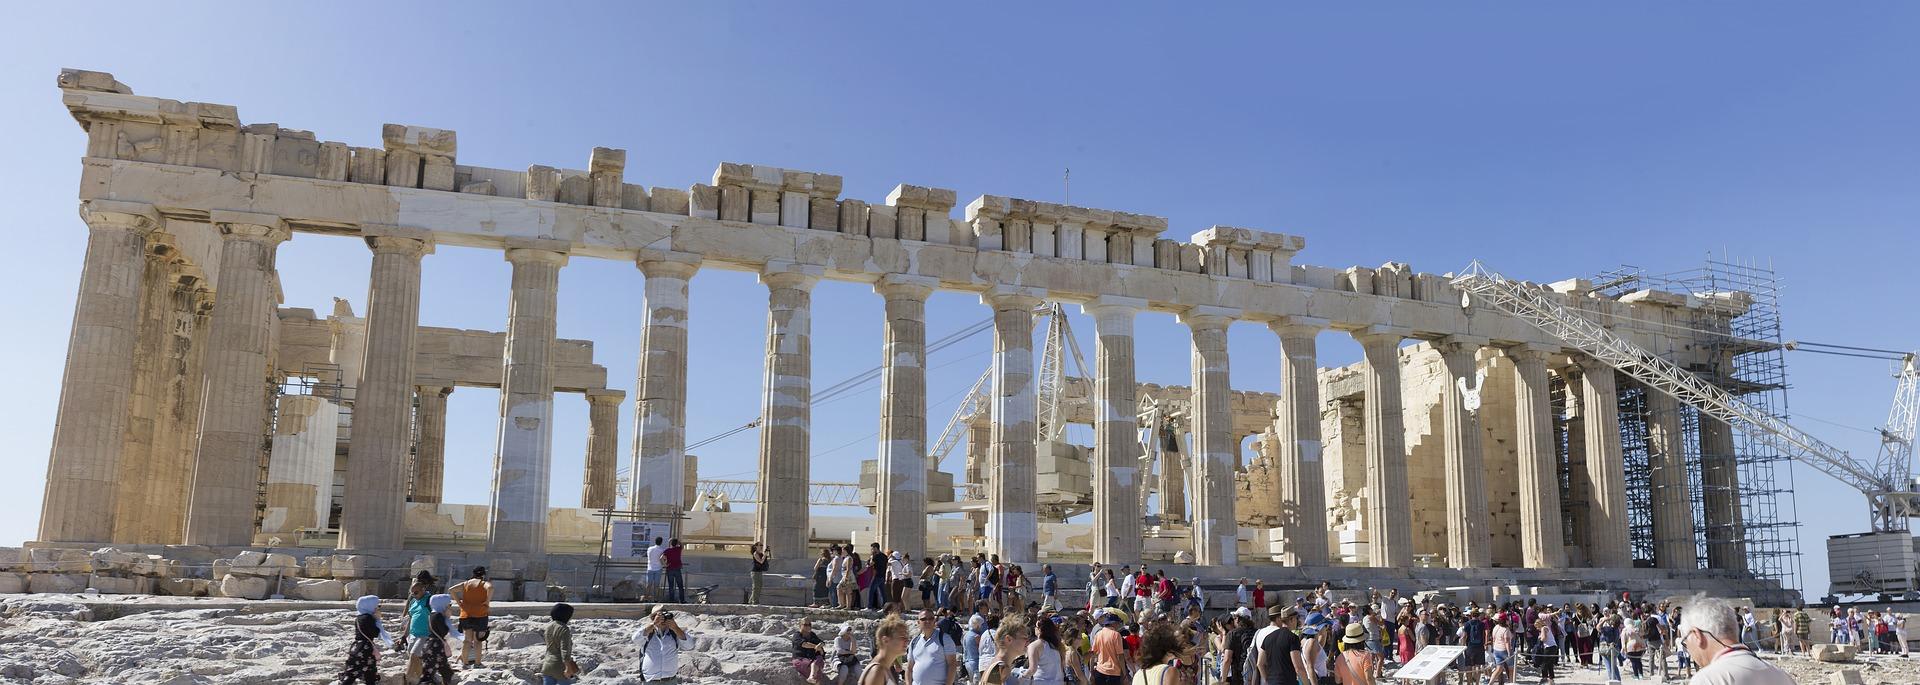 Akropolis Museum Ticket ab 8,02€ - Flug nach Athen ab 15,67€